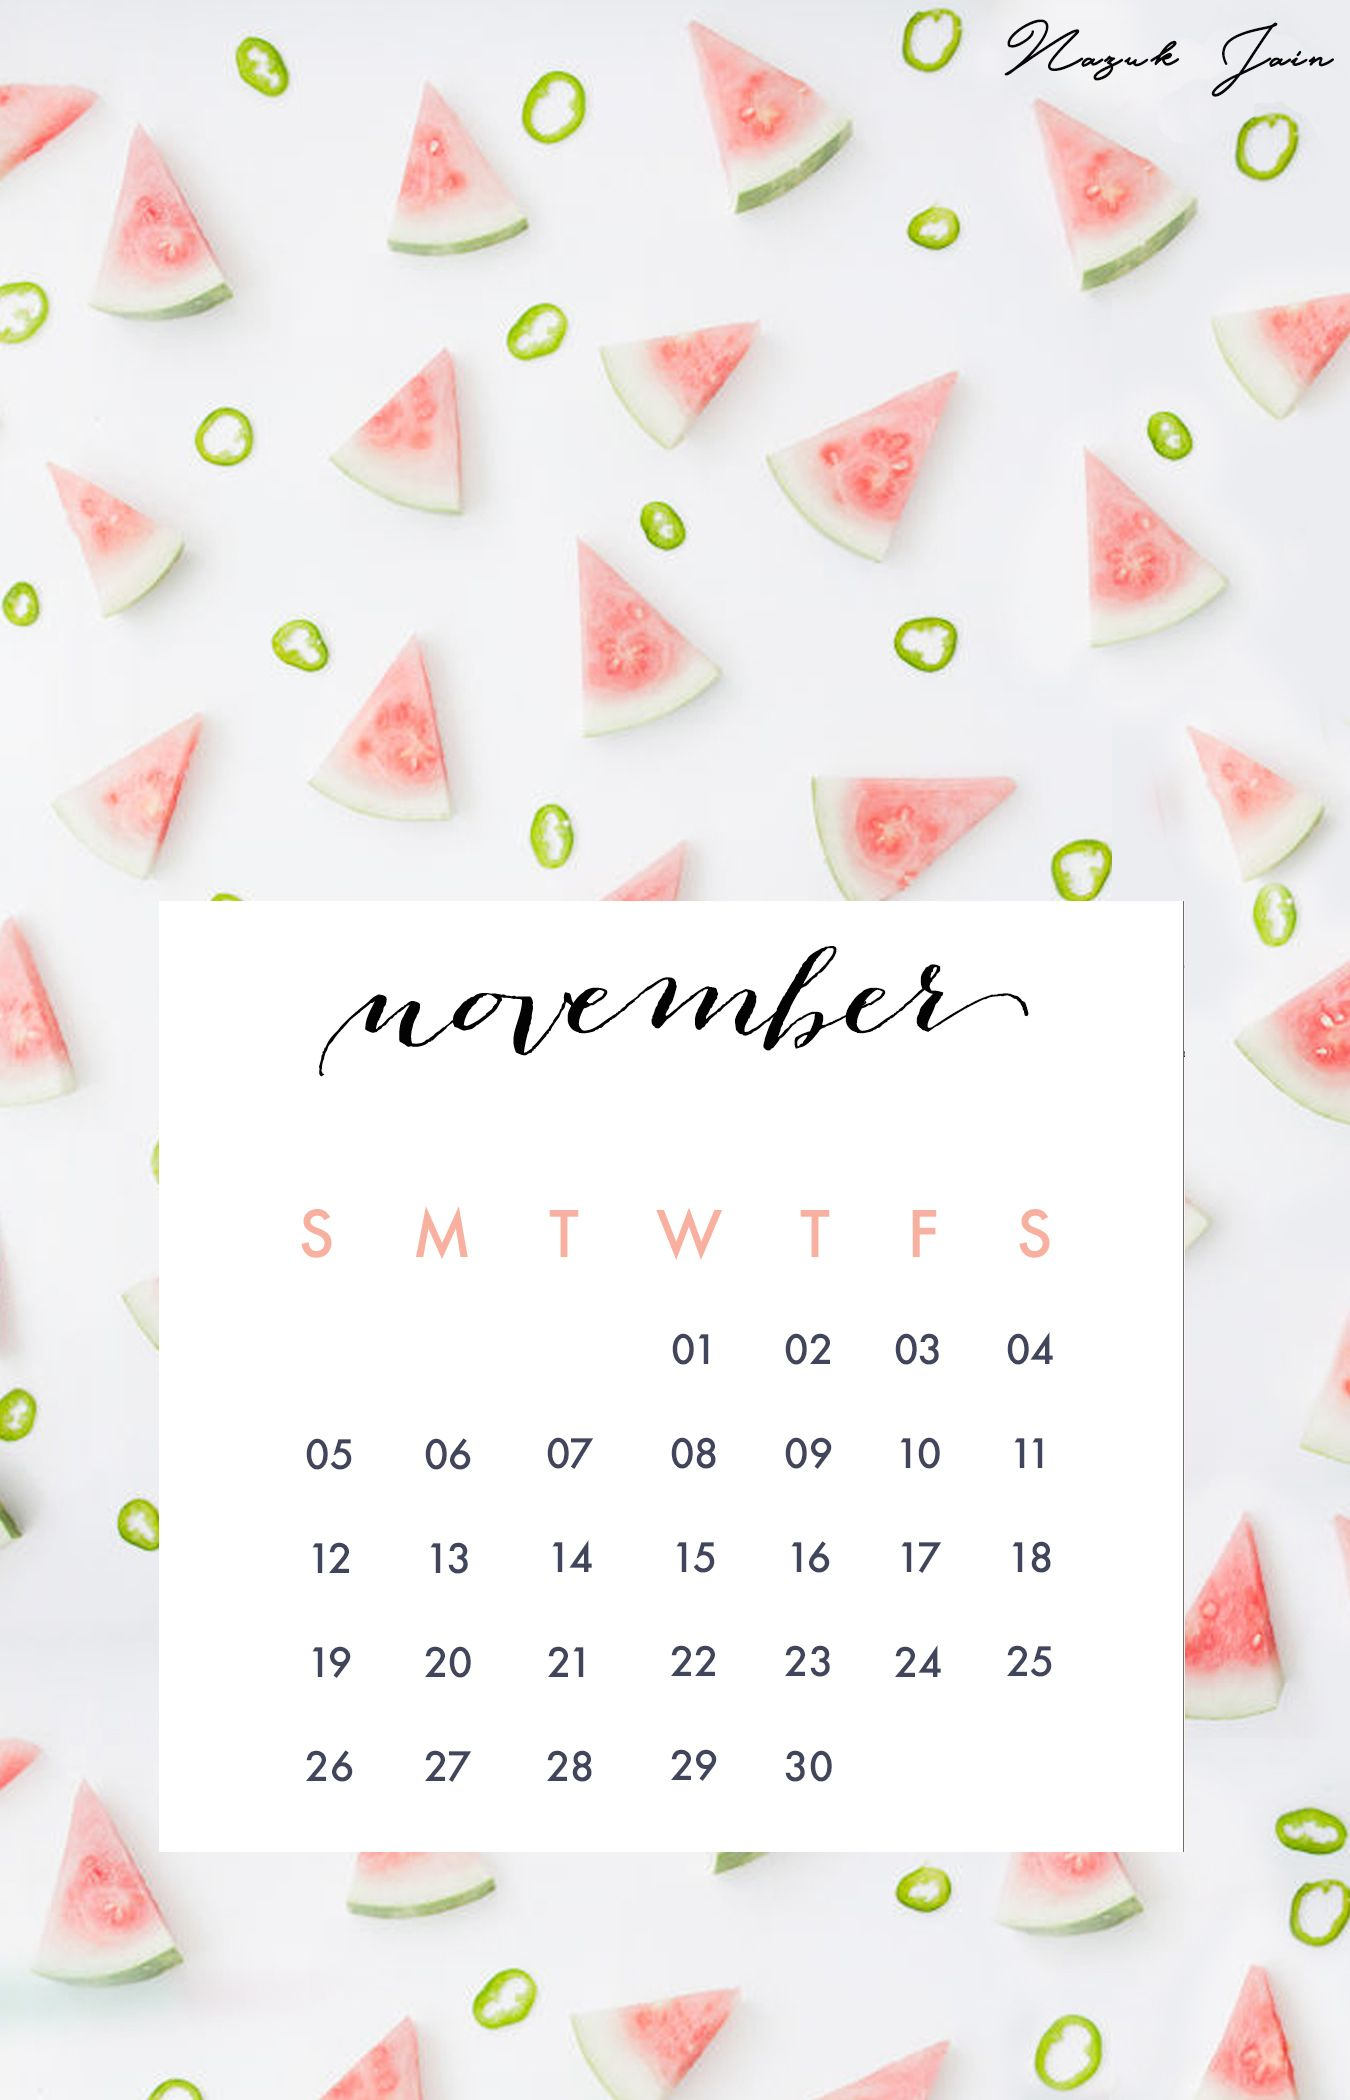 Iphone Calendar Wallpaper November : November free calendar printables by nazuk jain